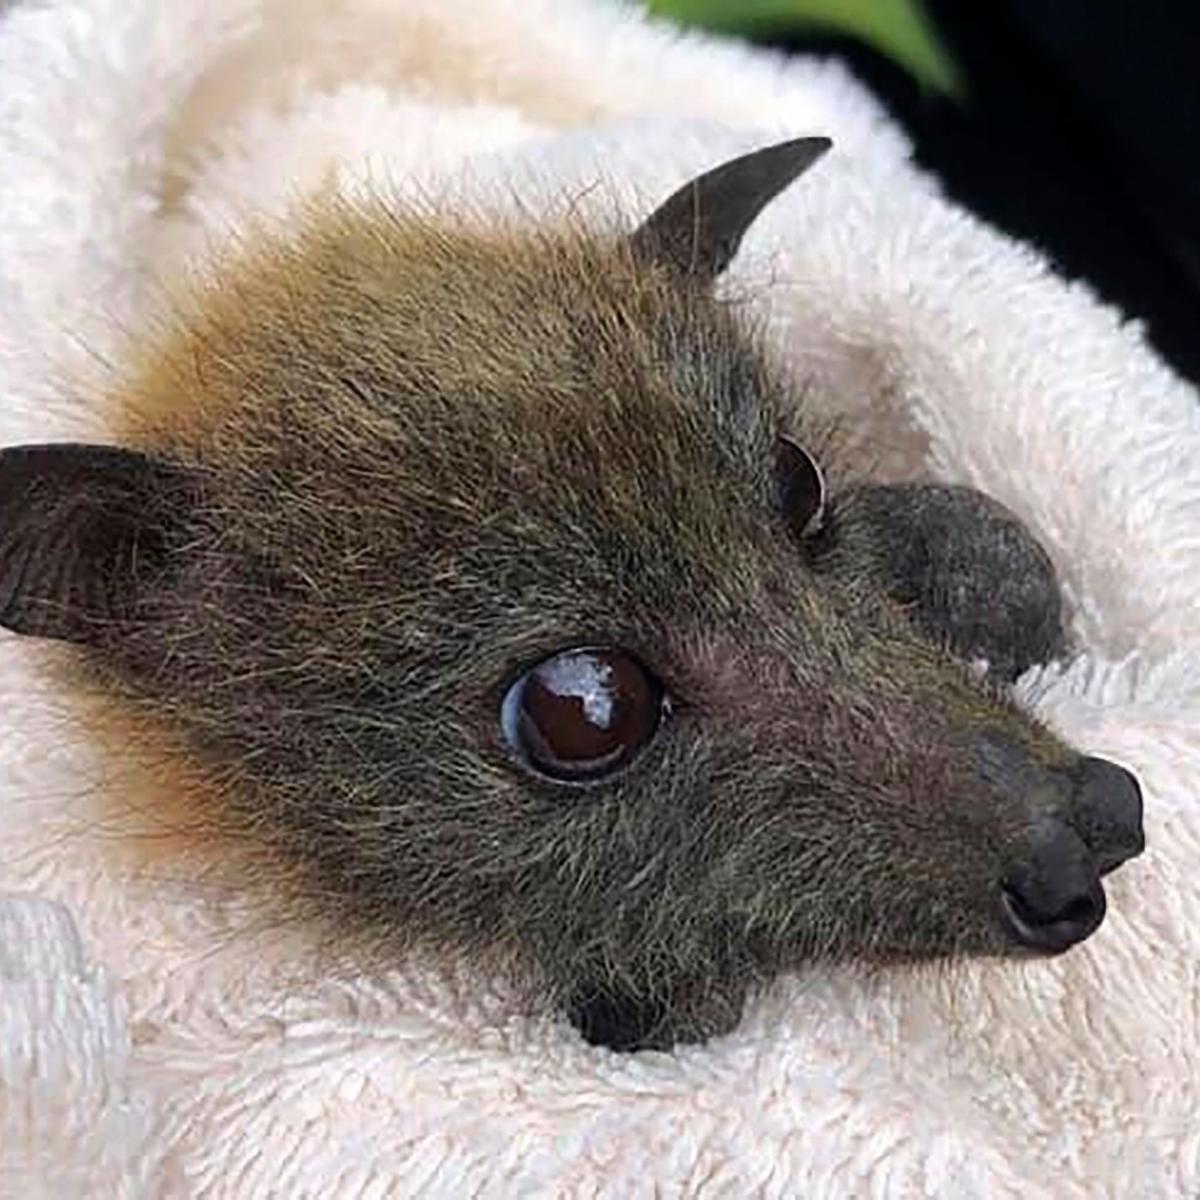 Carcass of rare species of horseshoe bat found in Vidarbha